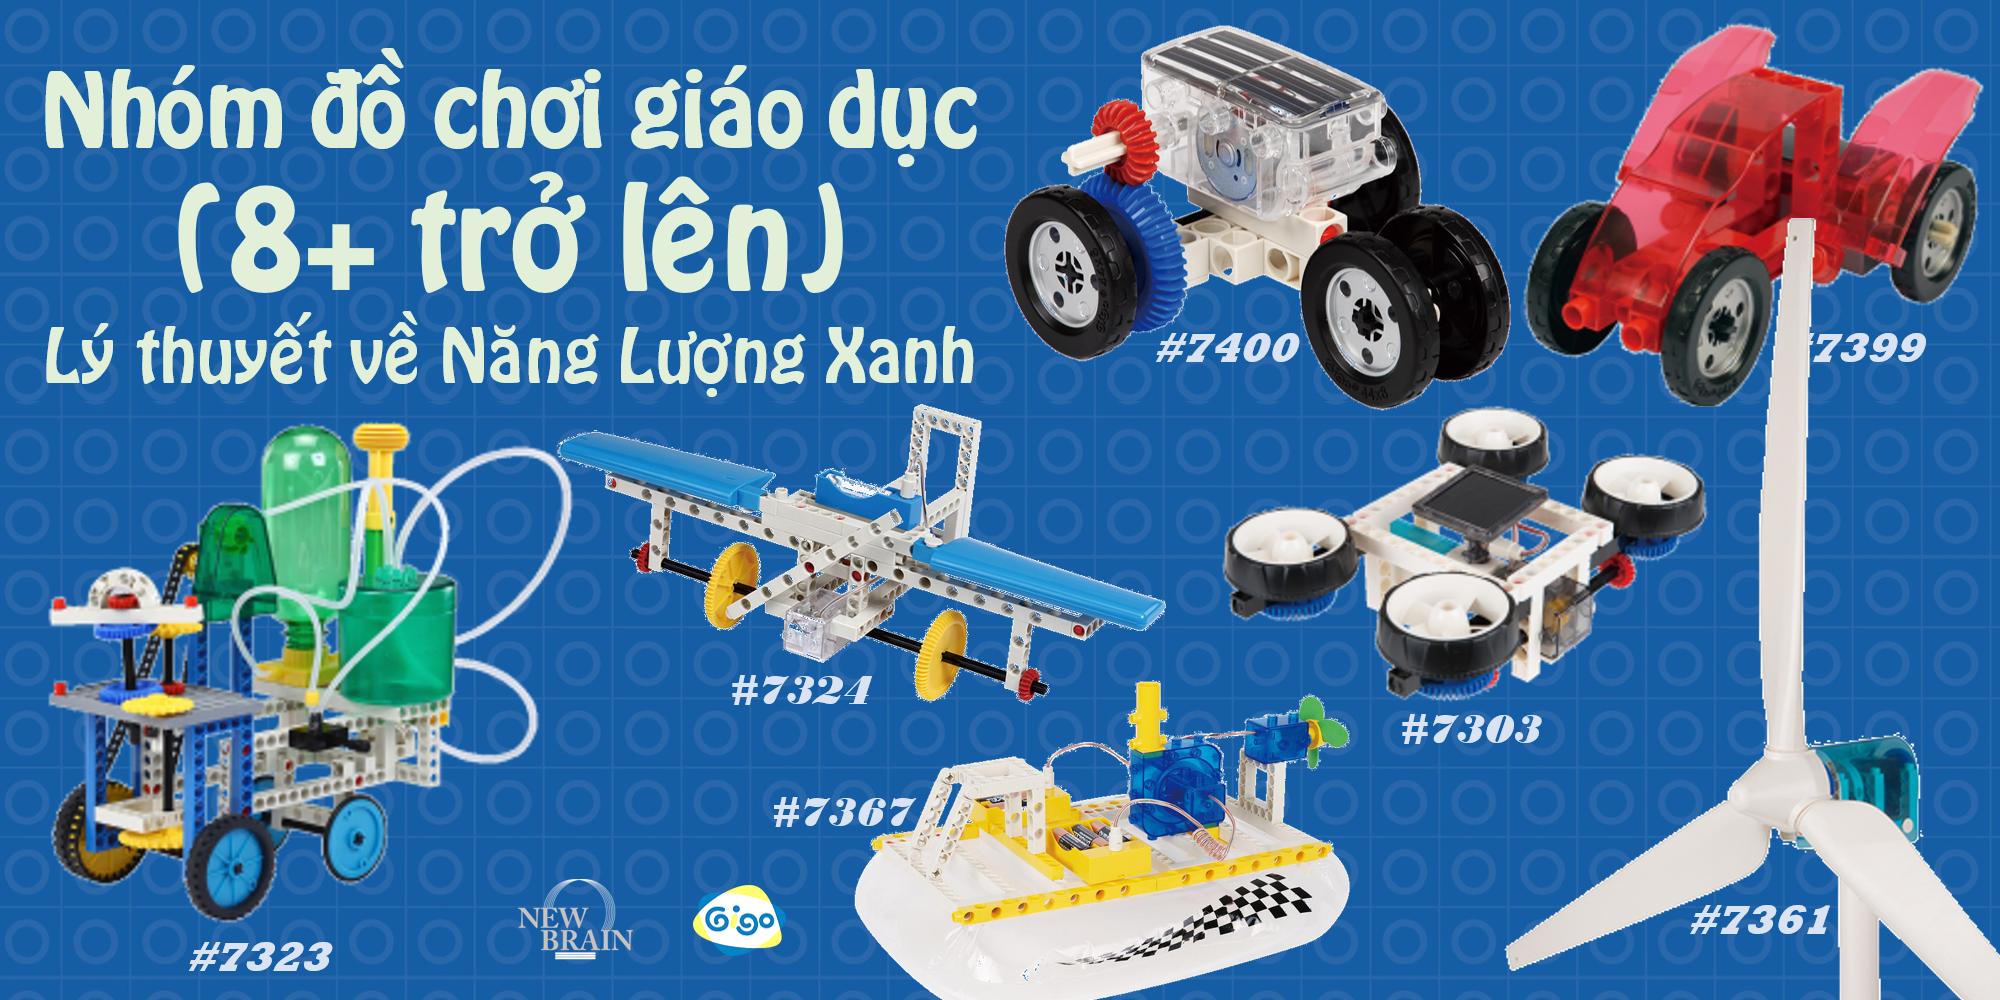 Đồ chơi giáo dục New Brain - Gigo Toys